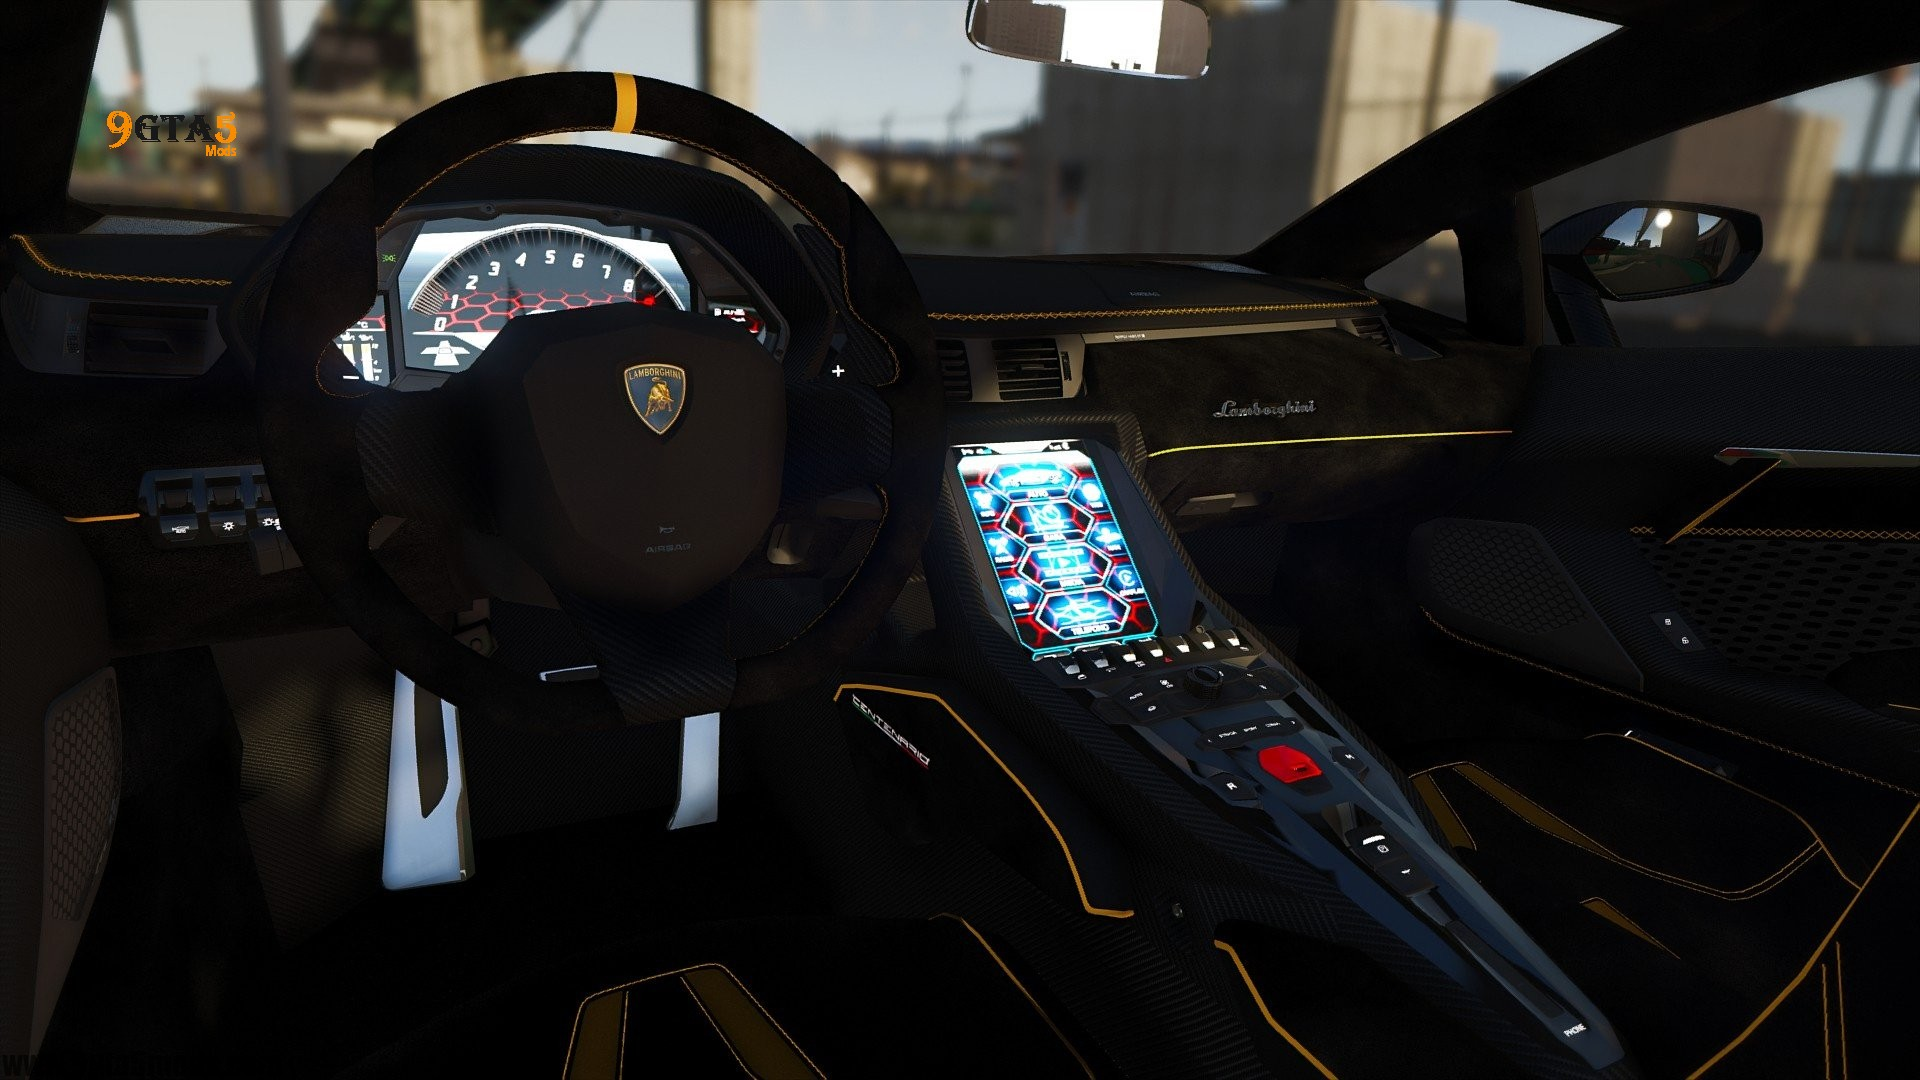 2016 Lamborghini Centenario Lp770 4 Gta 5 Vehicles 9gta5mods Com